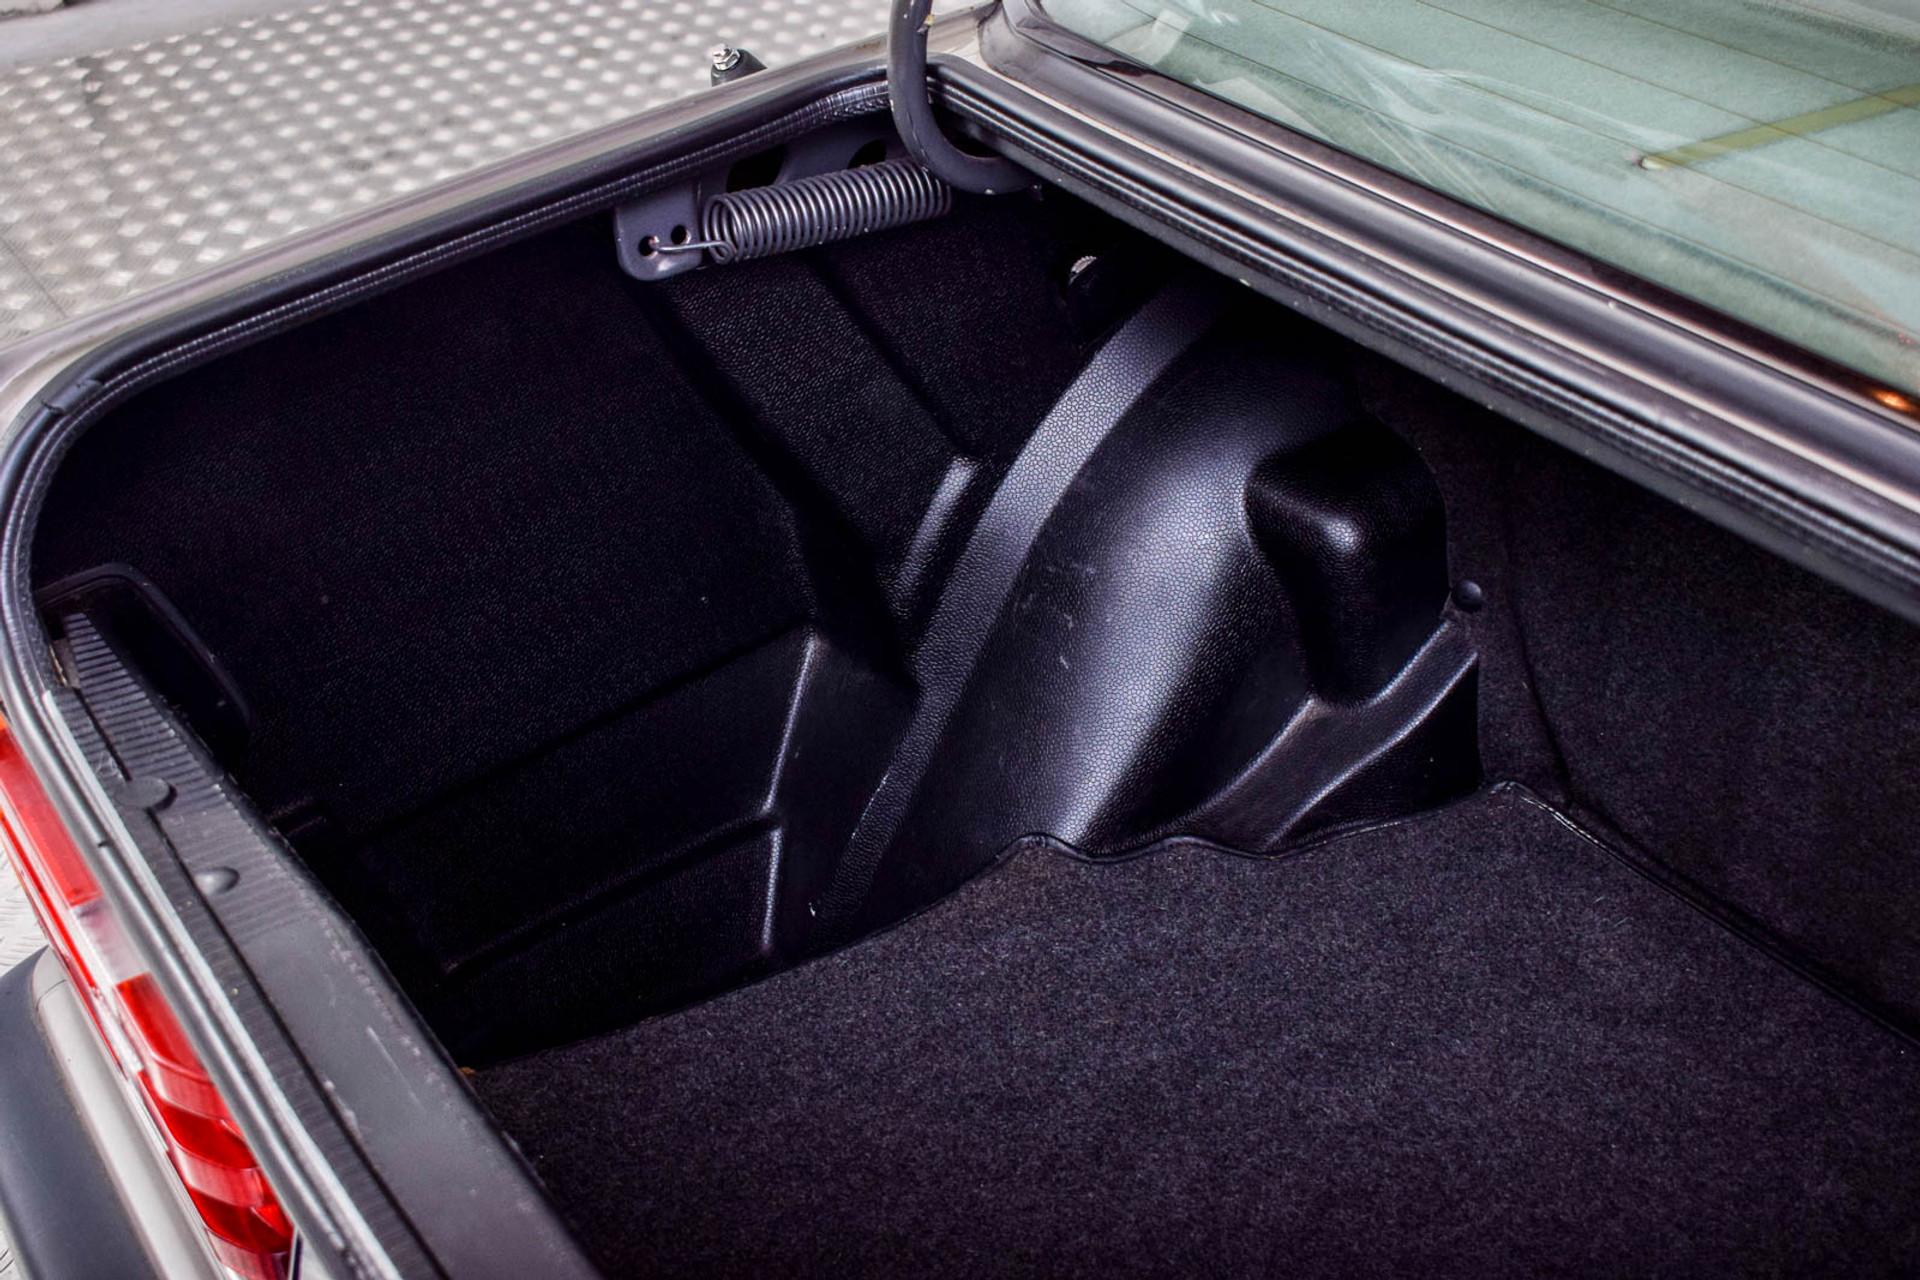 Mercedes-Benz 190 2.5 D Turbo Diesel Foto 54